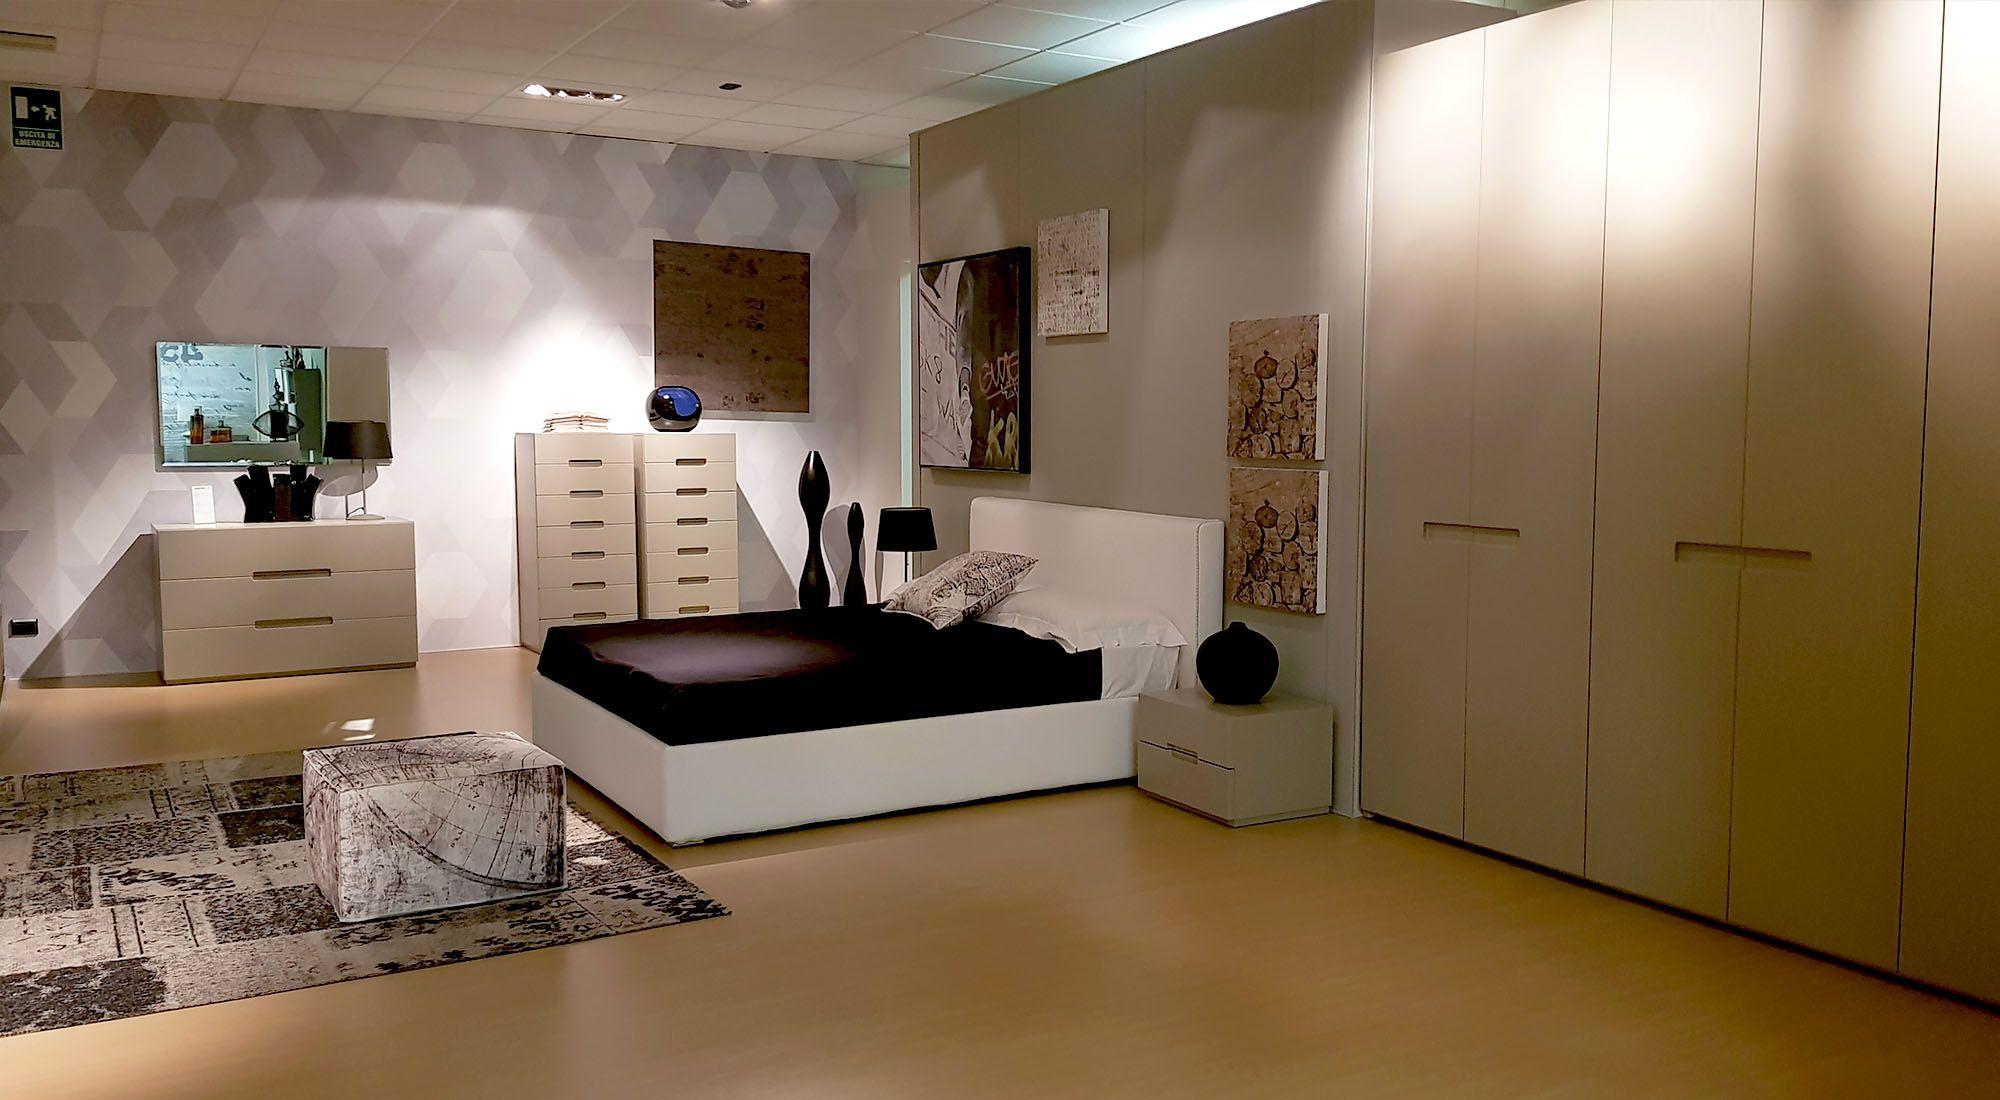 Arredamento Per Camera Matrimoniale.Camere Da Letto A Padova Arredamento Per Camere Moderne Camera